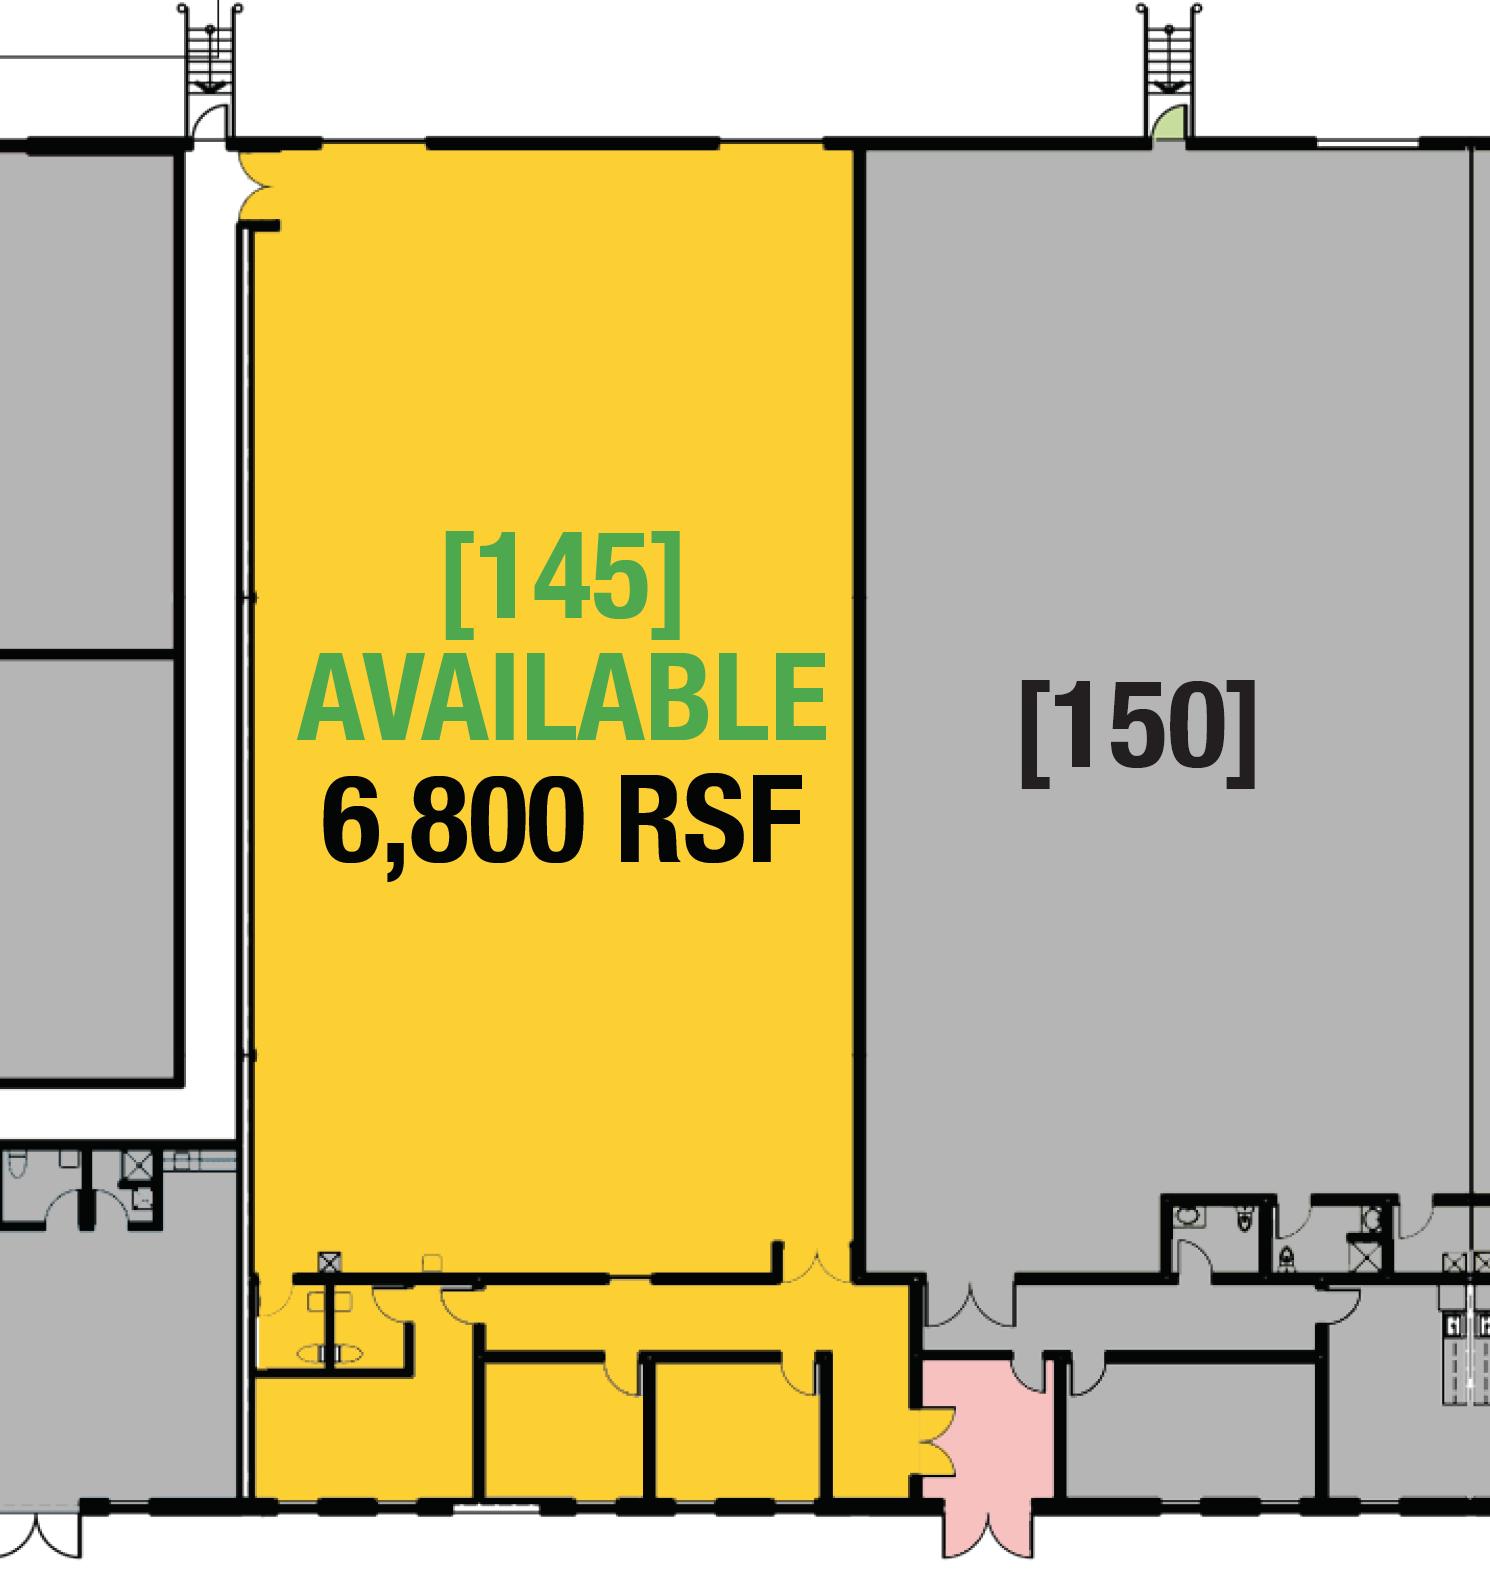 SUITE 145 - 6,800 RSF